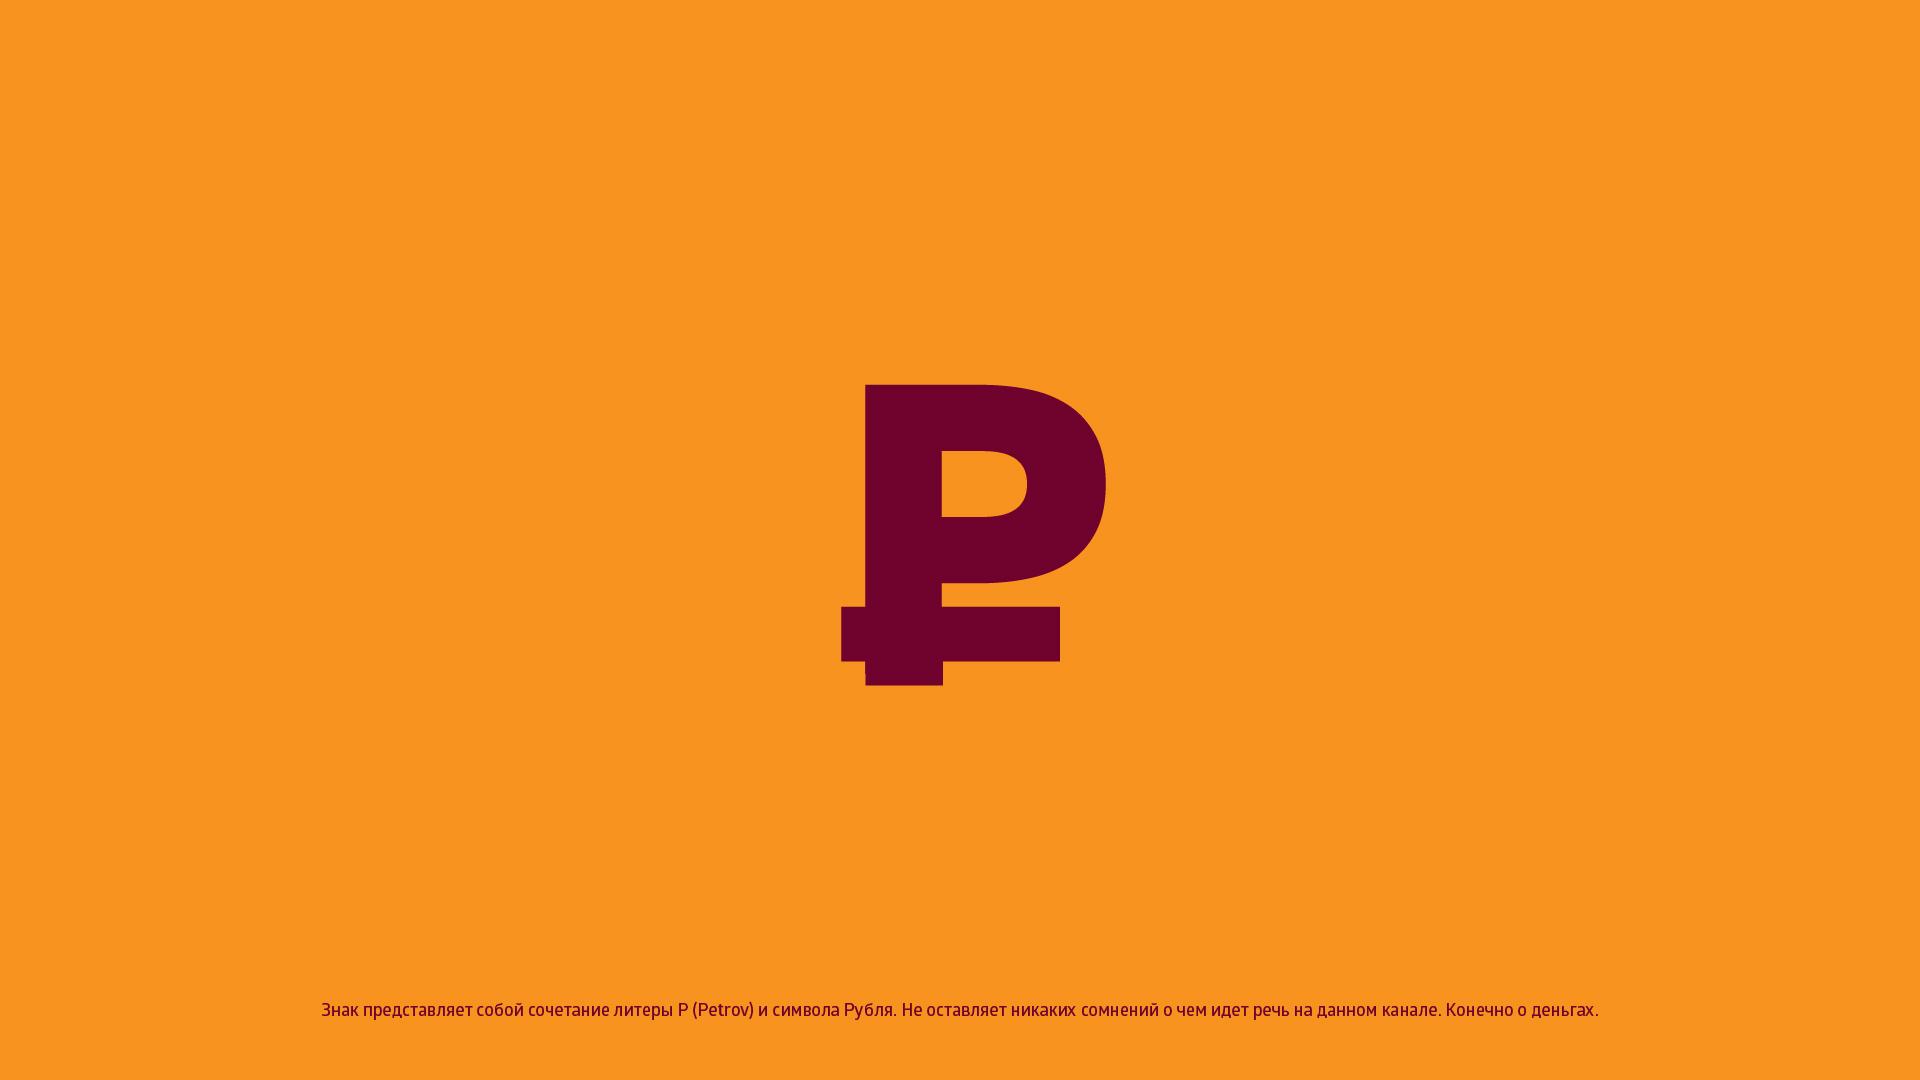 Создать логотип для YouTube канала  фото f_5575c0ab66aef72c.jpg